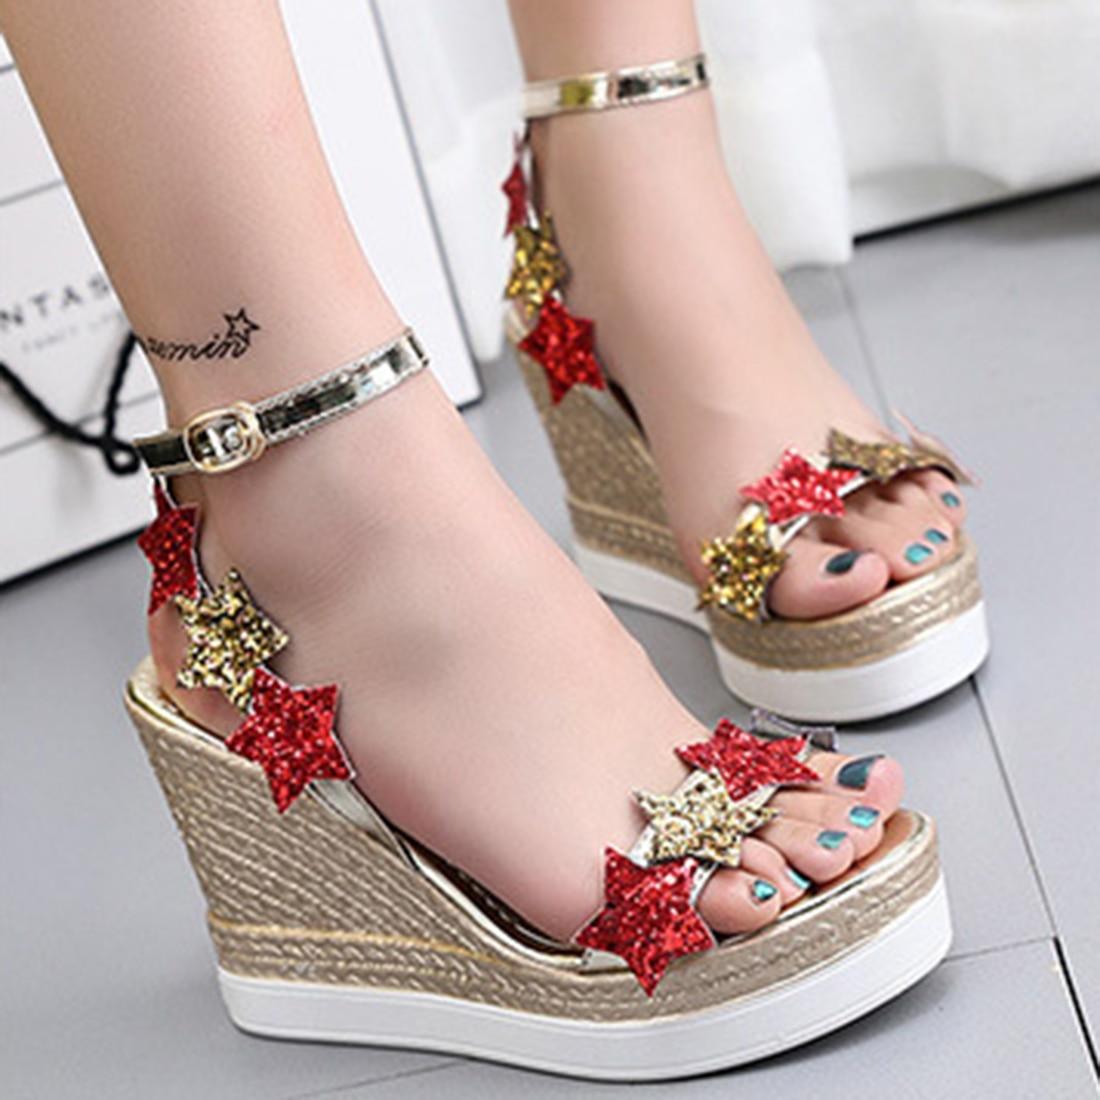 Women's sandals with bling - Mixed Color Fashion Summer Wedges Women S Sandals Platform Bling Stars Flip Flops Open Toe High